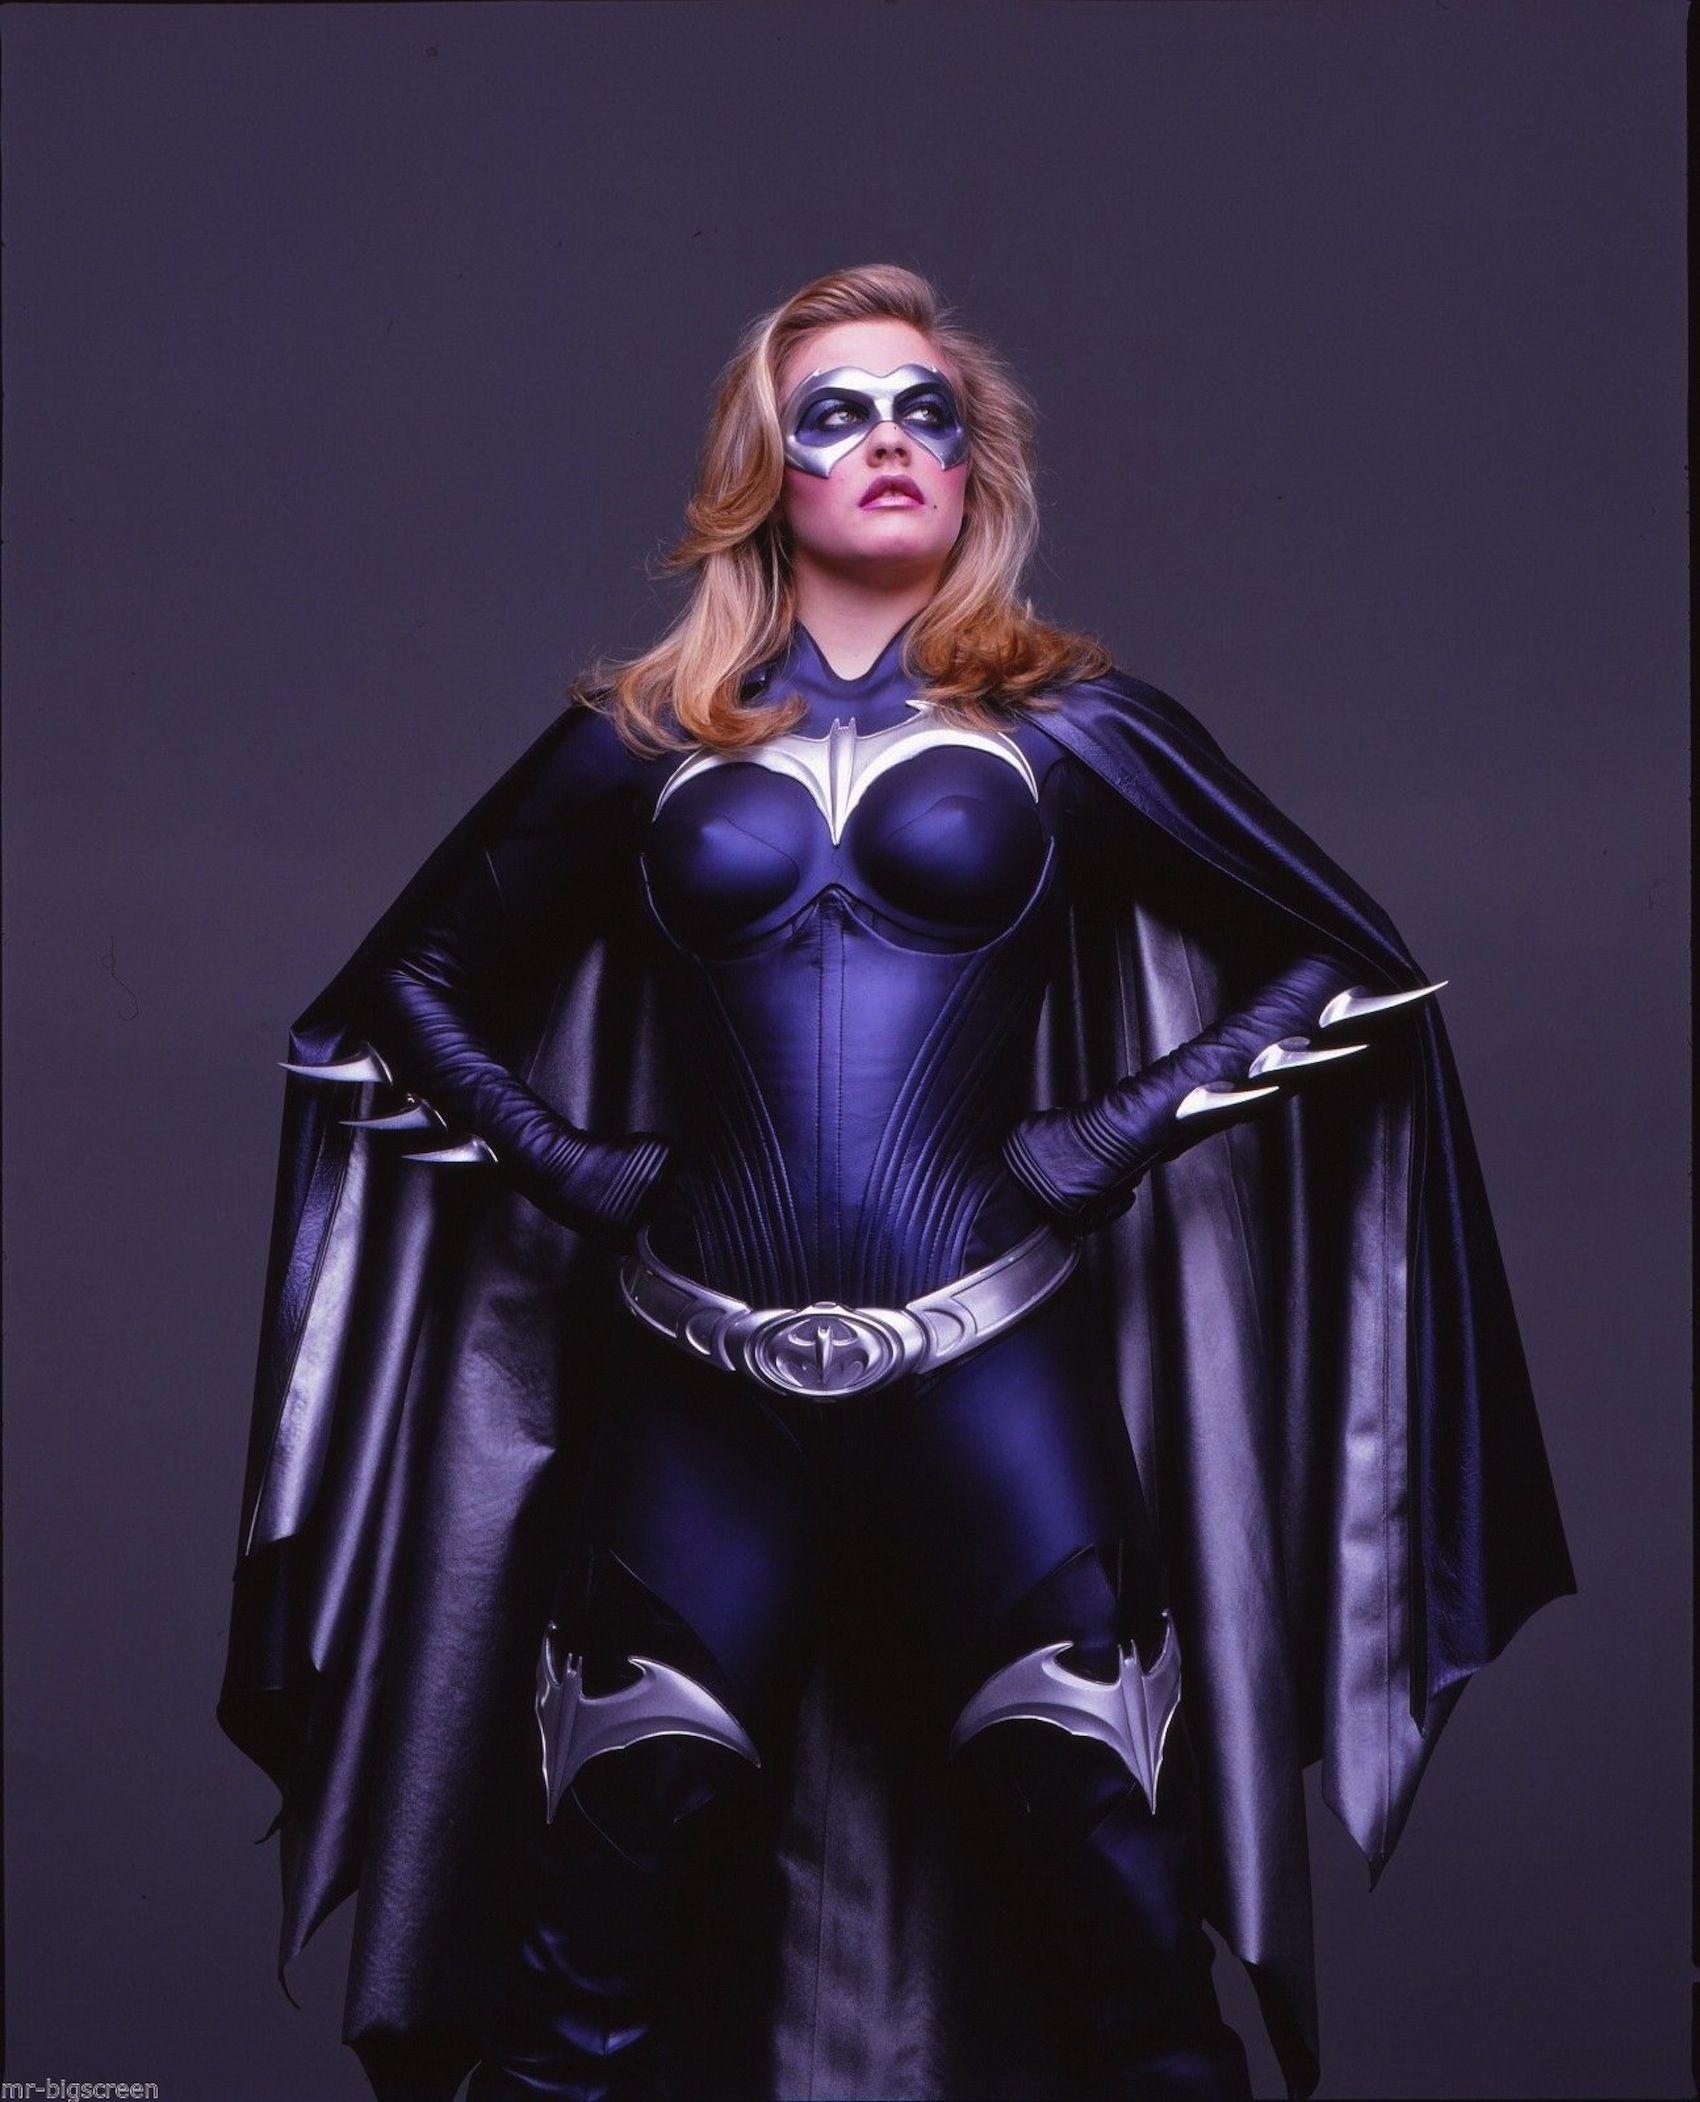 Alicia Silverstone As a Batgirl